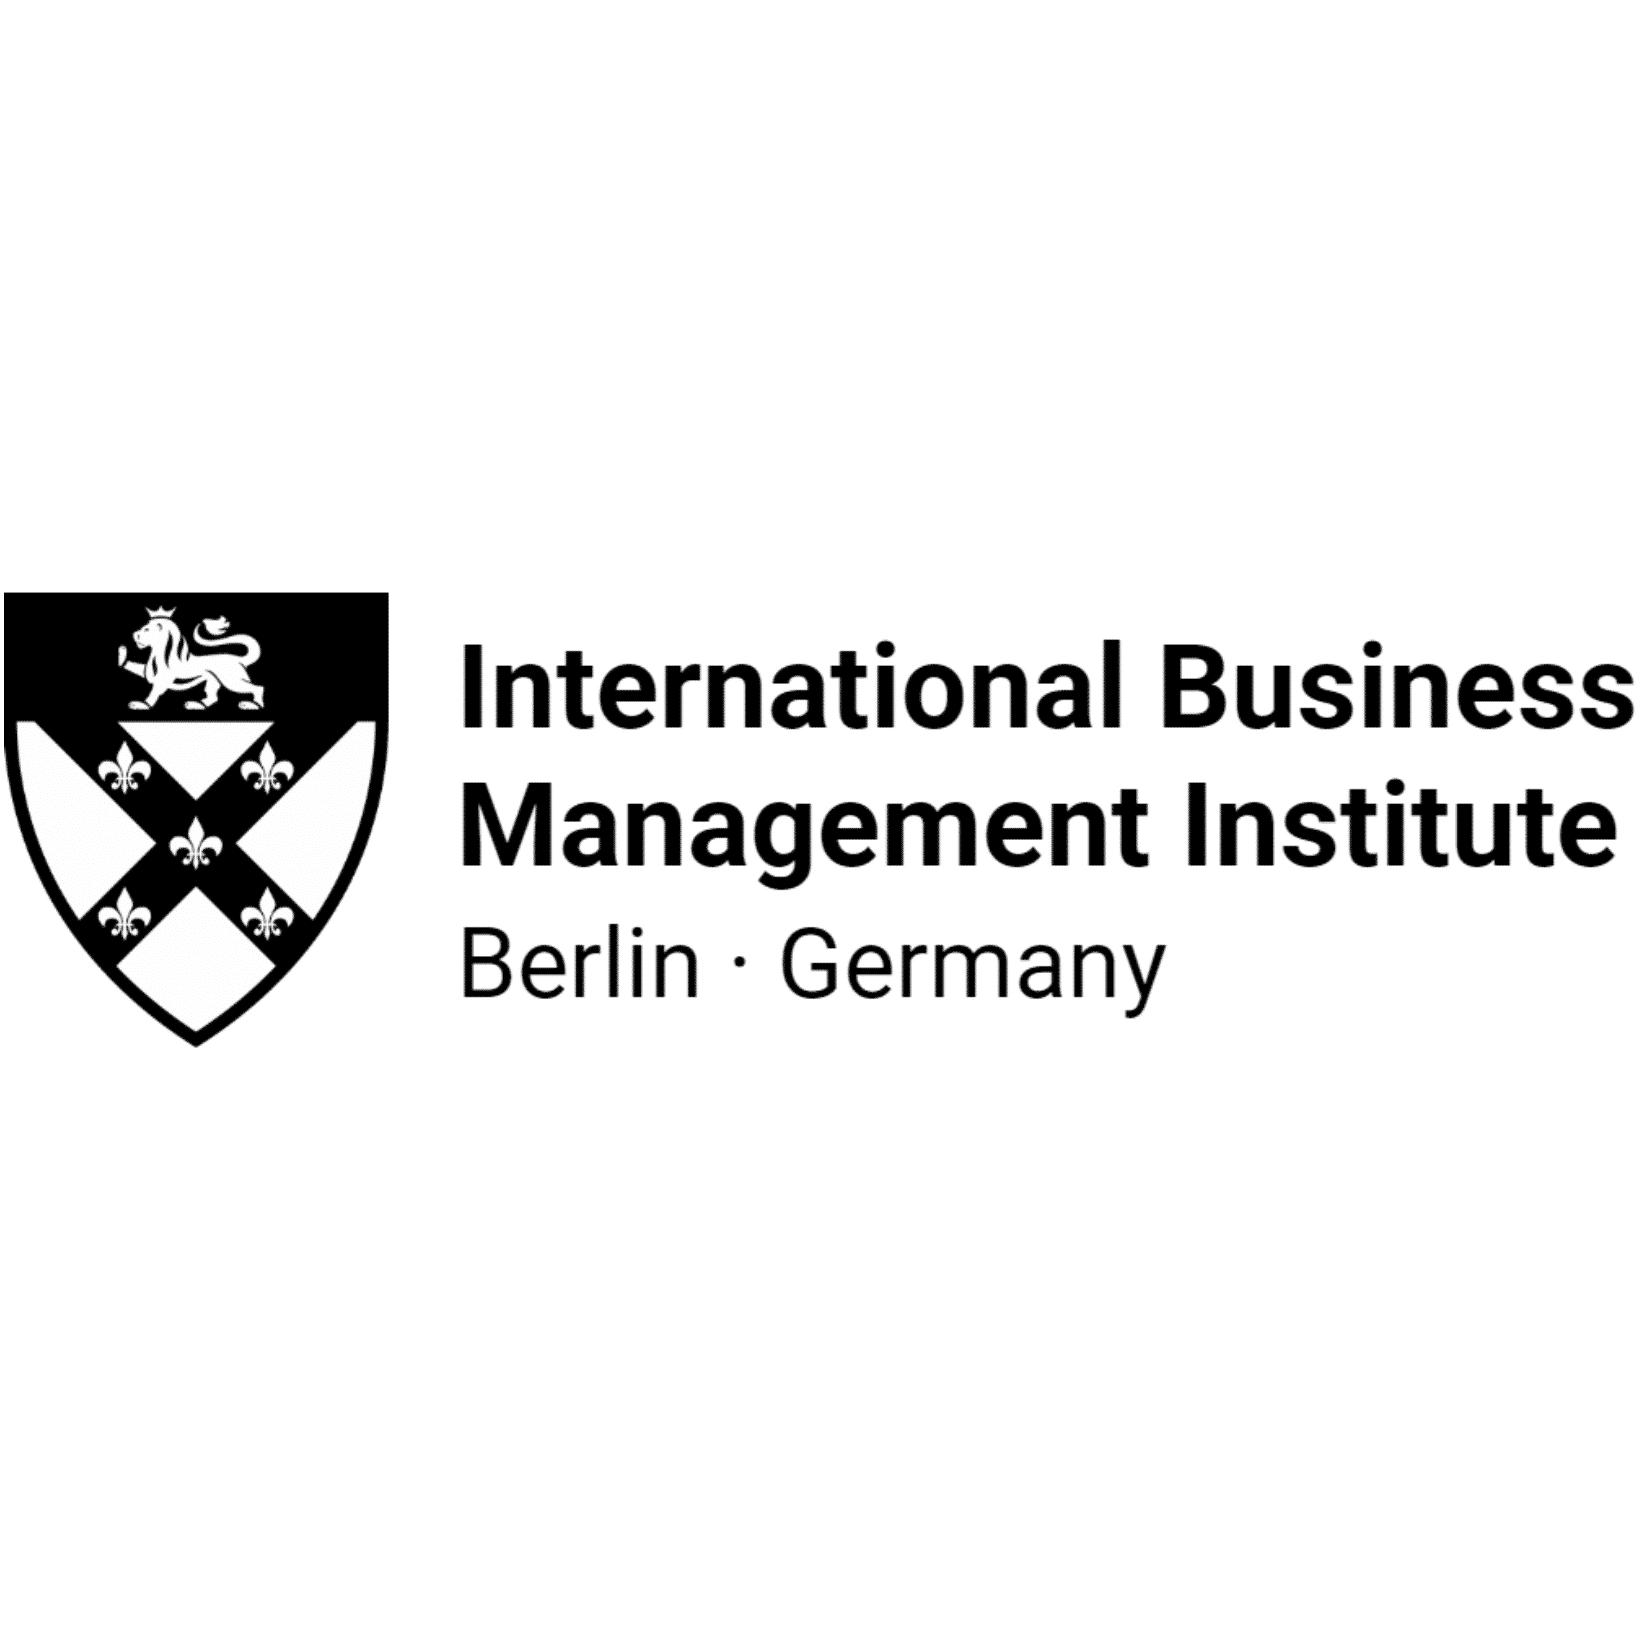 IBMI Berlin